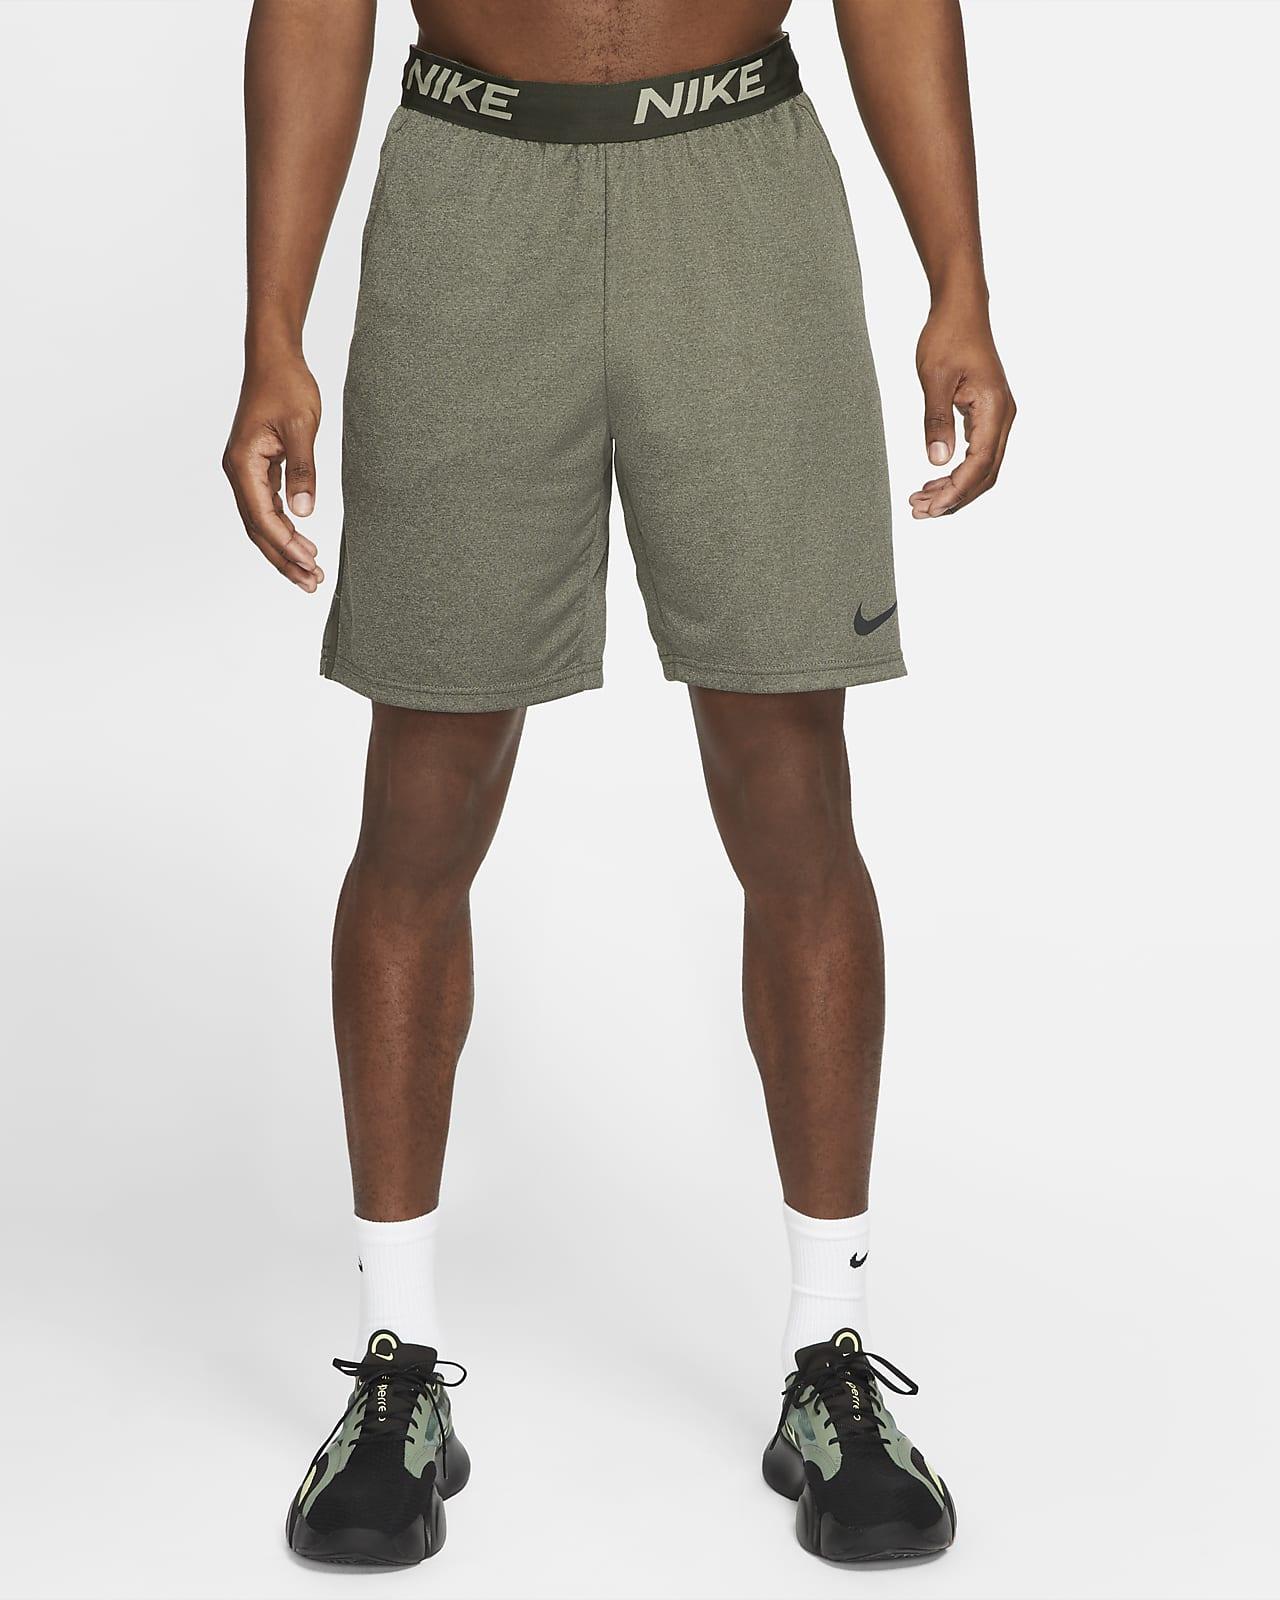 Nike Dri-FIT Veneer Men's Training Shorts